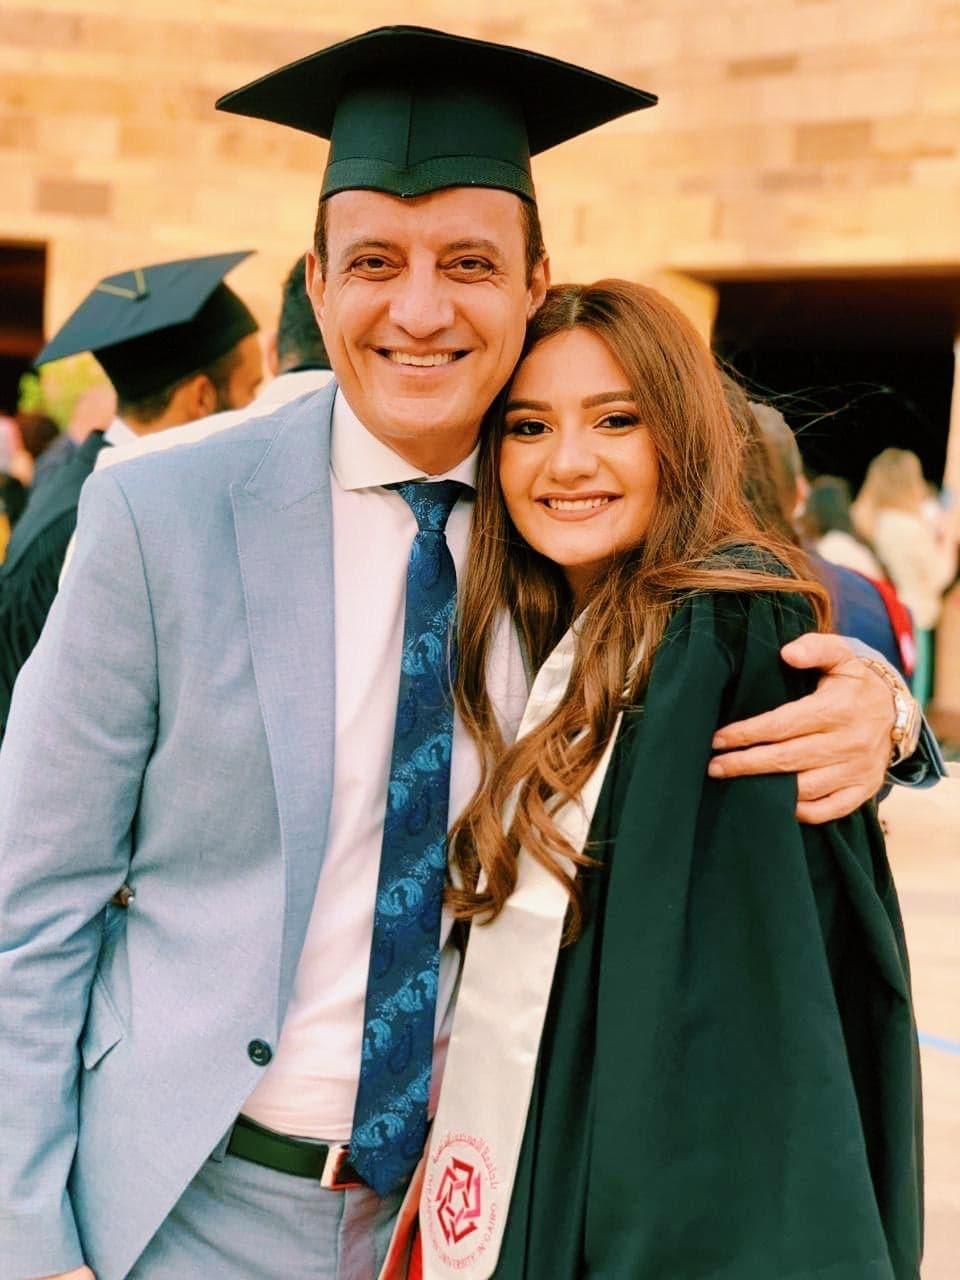 طارق علام يشهد حفل تخرج ابنته عهد (4)